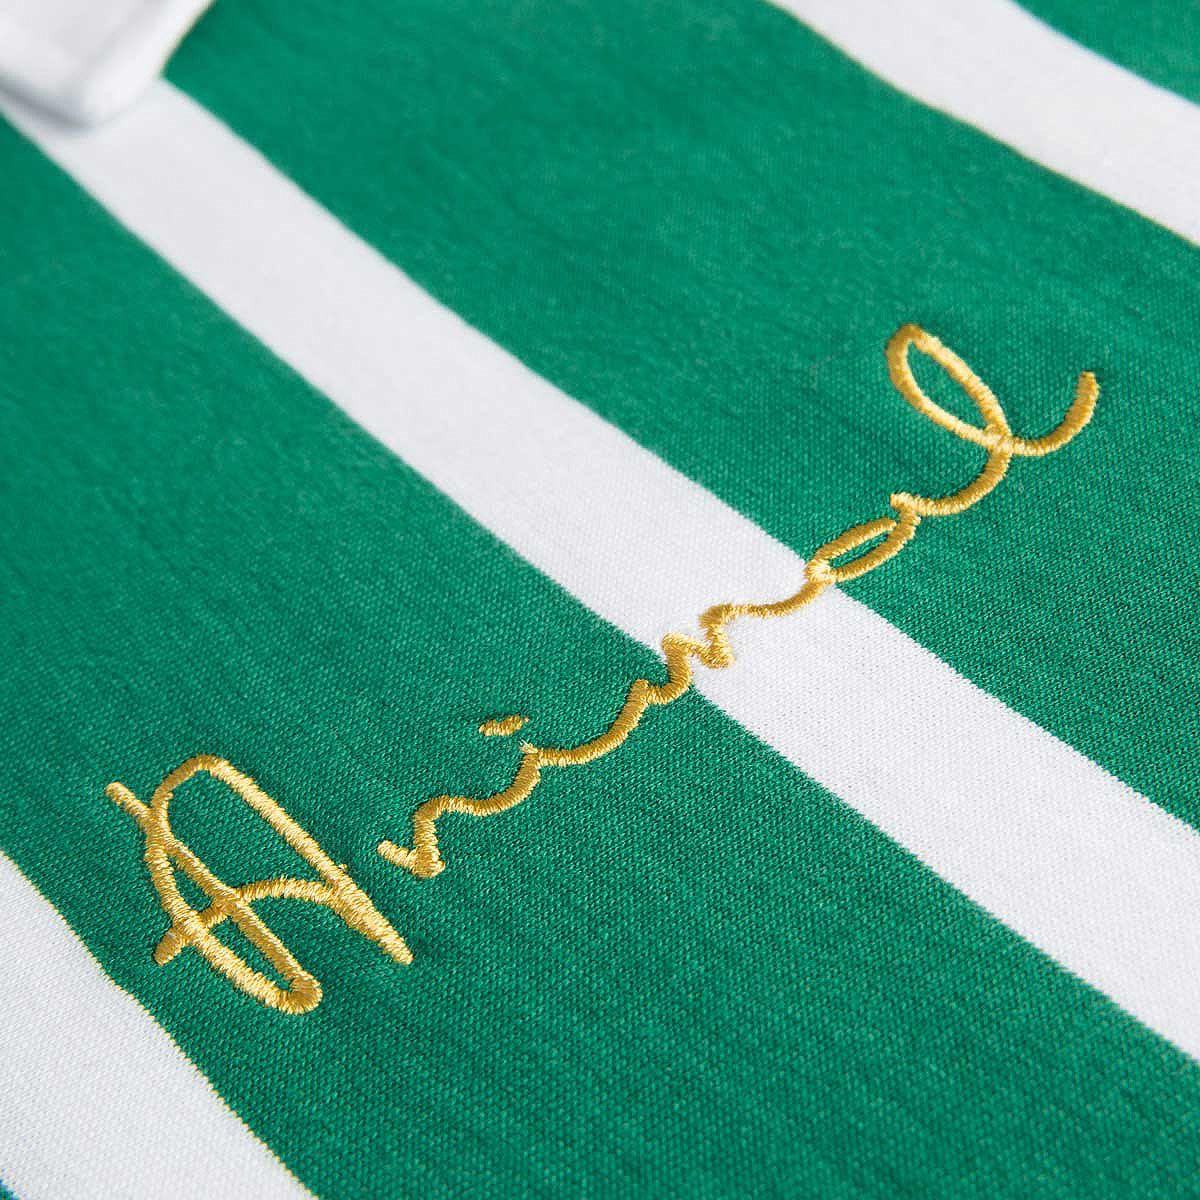 Camisa Palmeiras Retrô Gol Animal 1993 Masculina